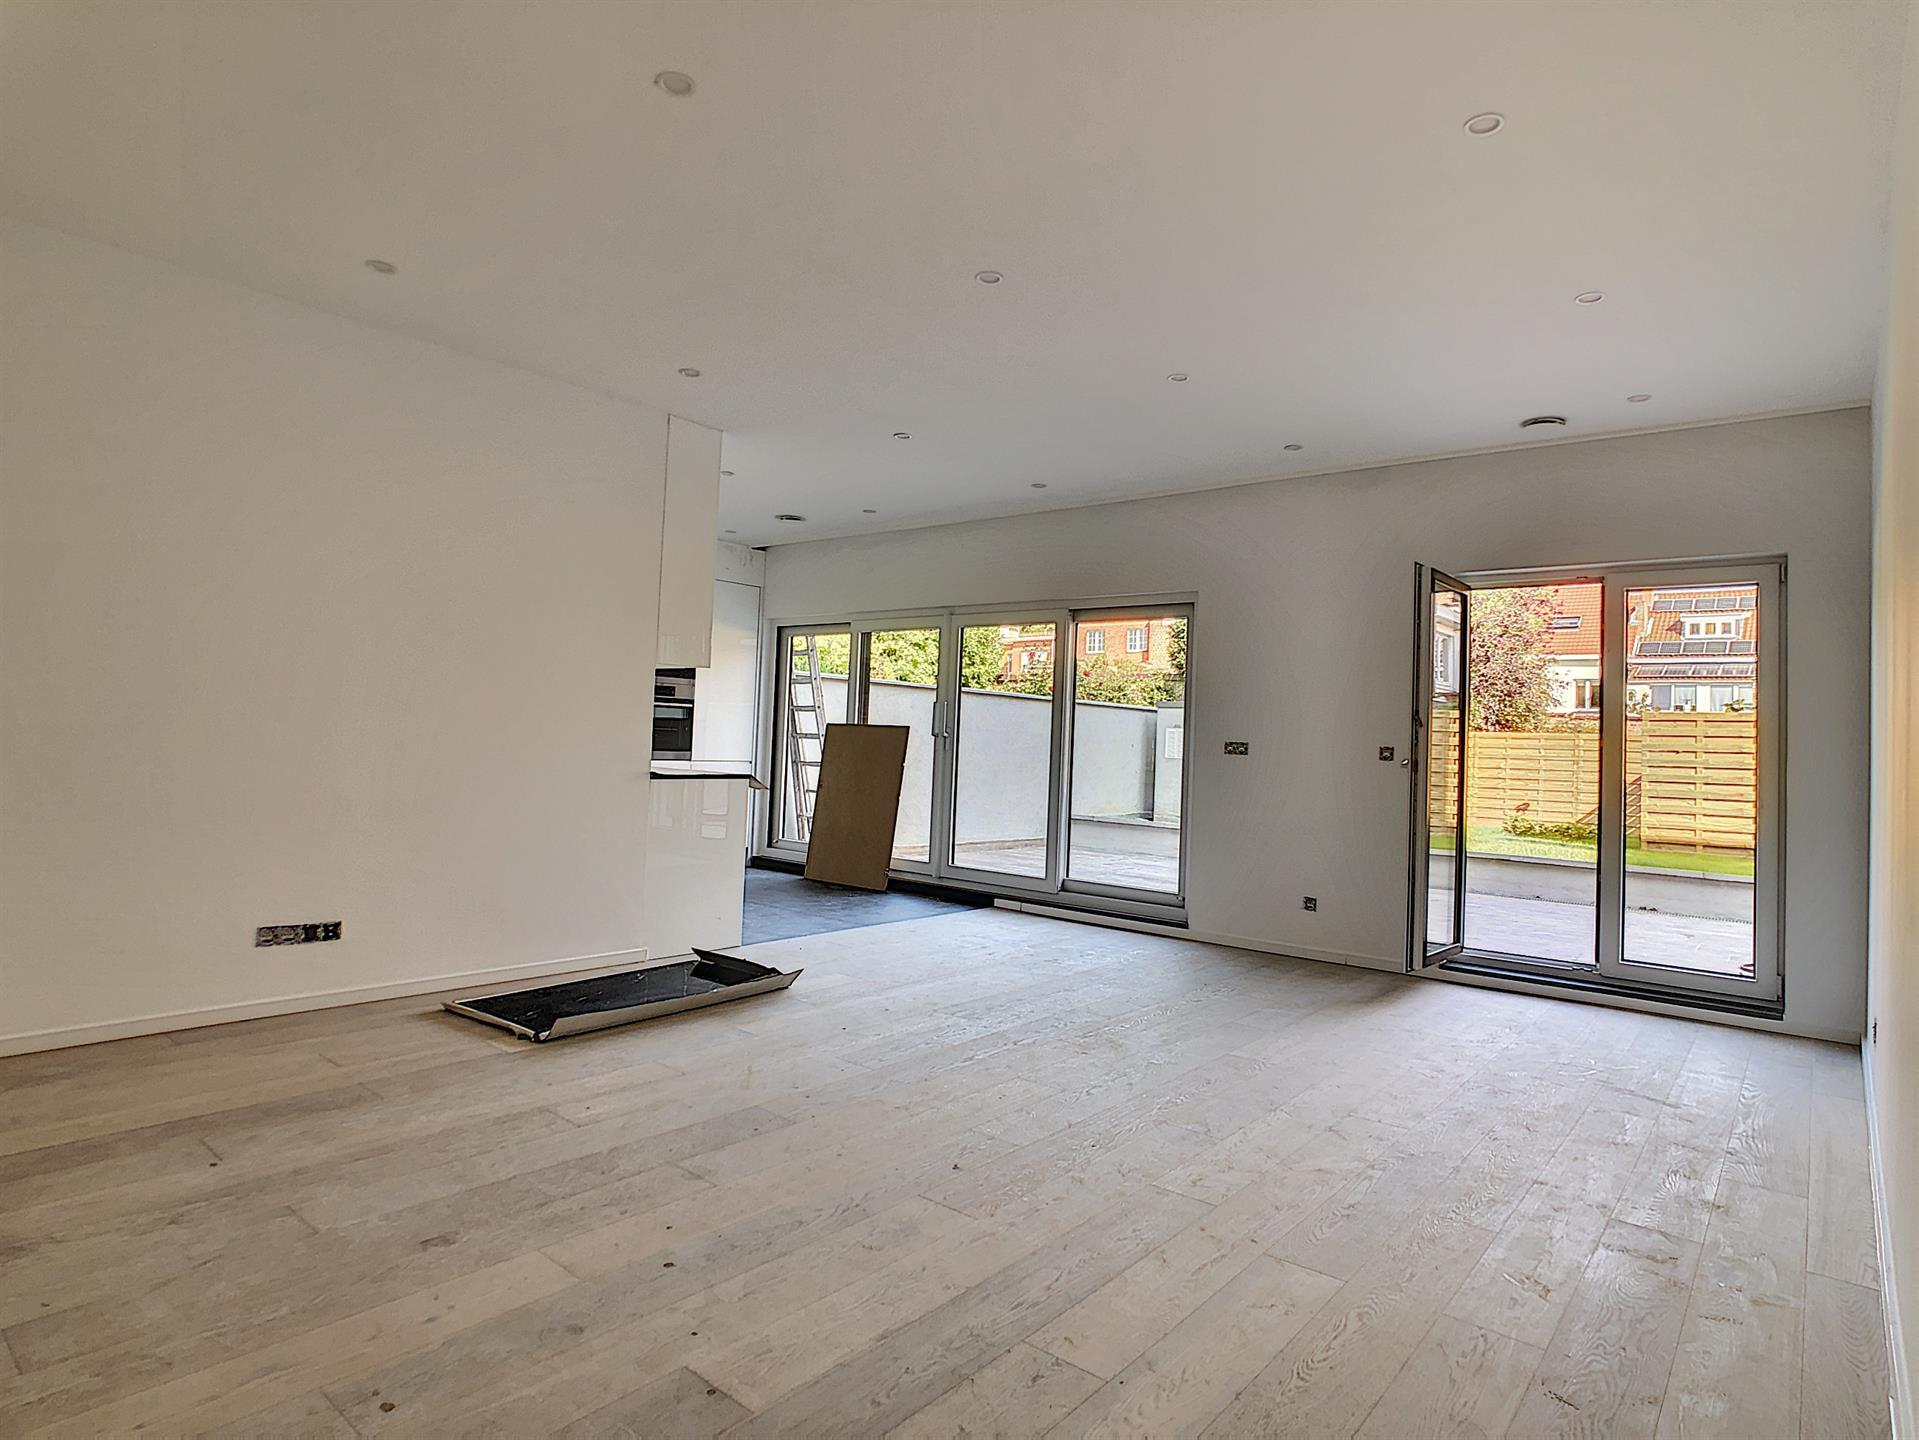 Appartement - Anderlecht - #4252385-17